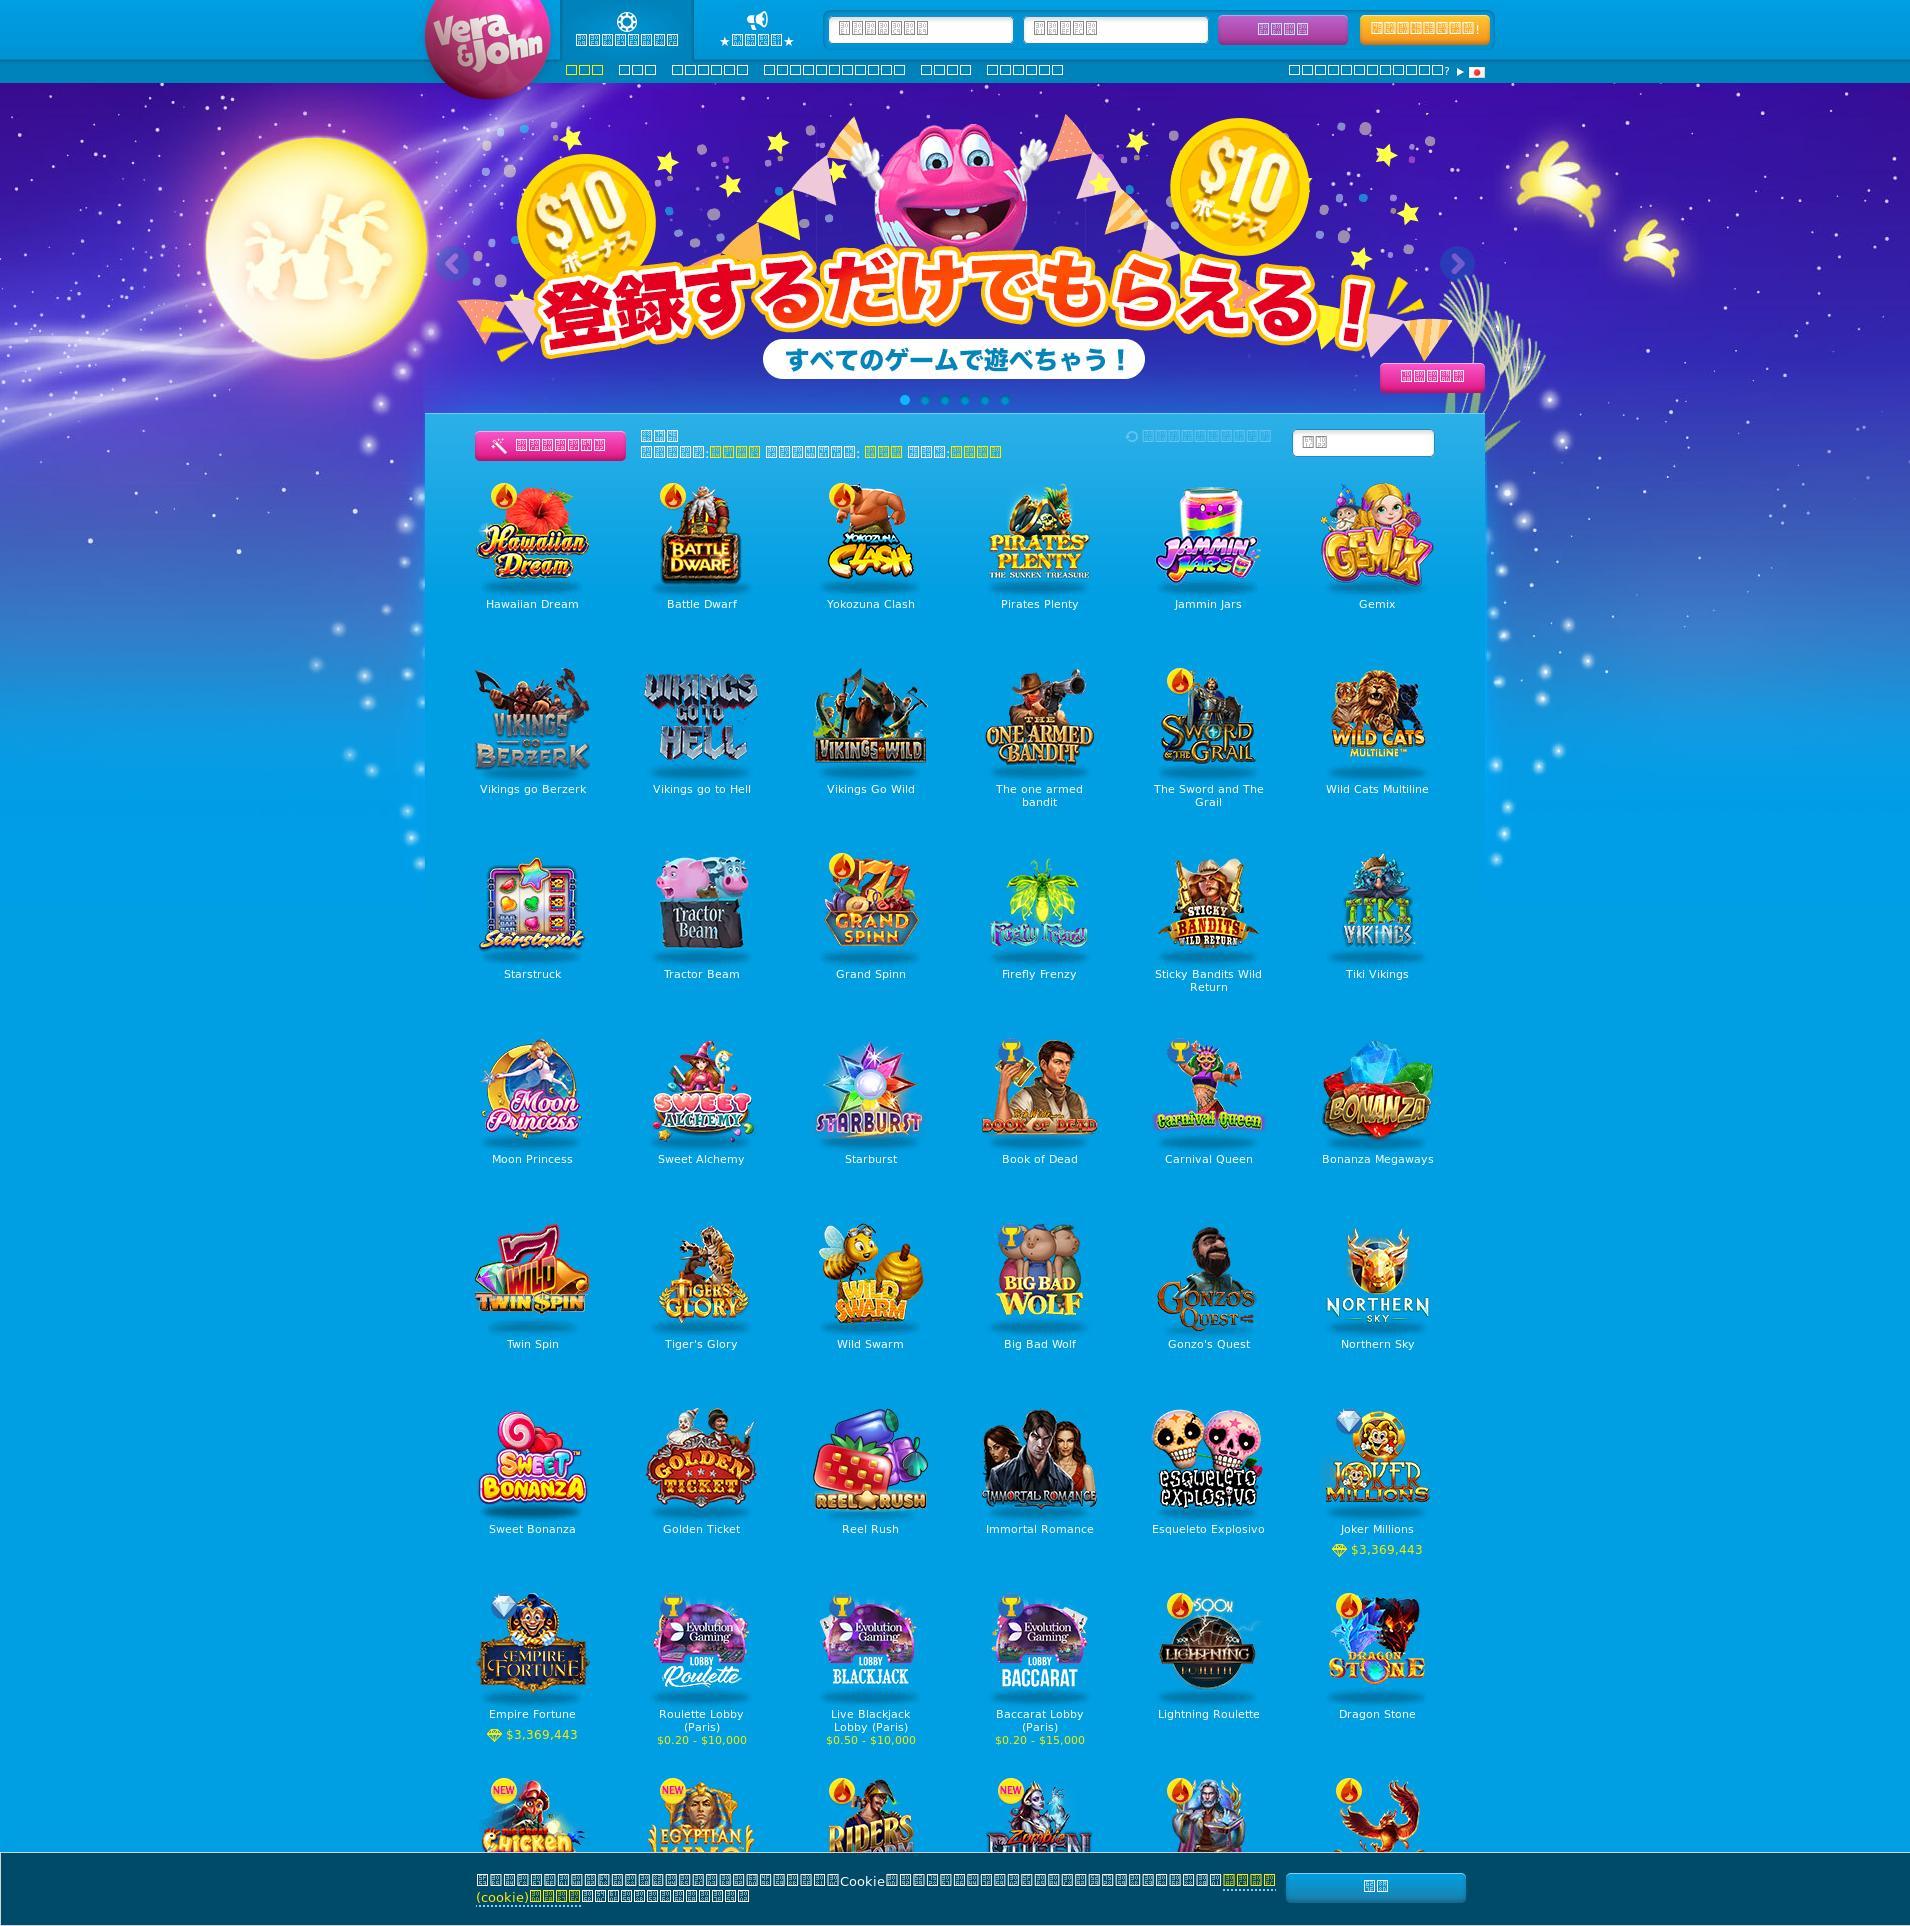 Casino screen Lobby 2019-09-15 for Japan